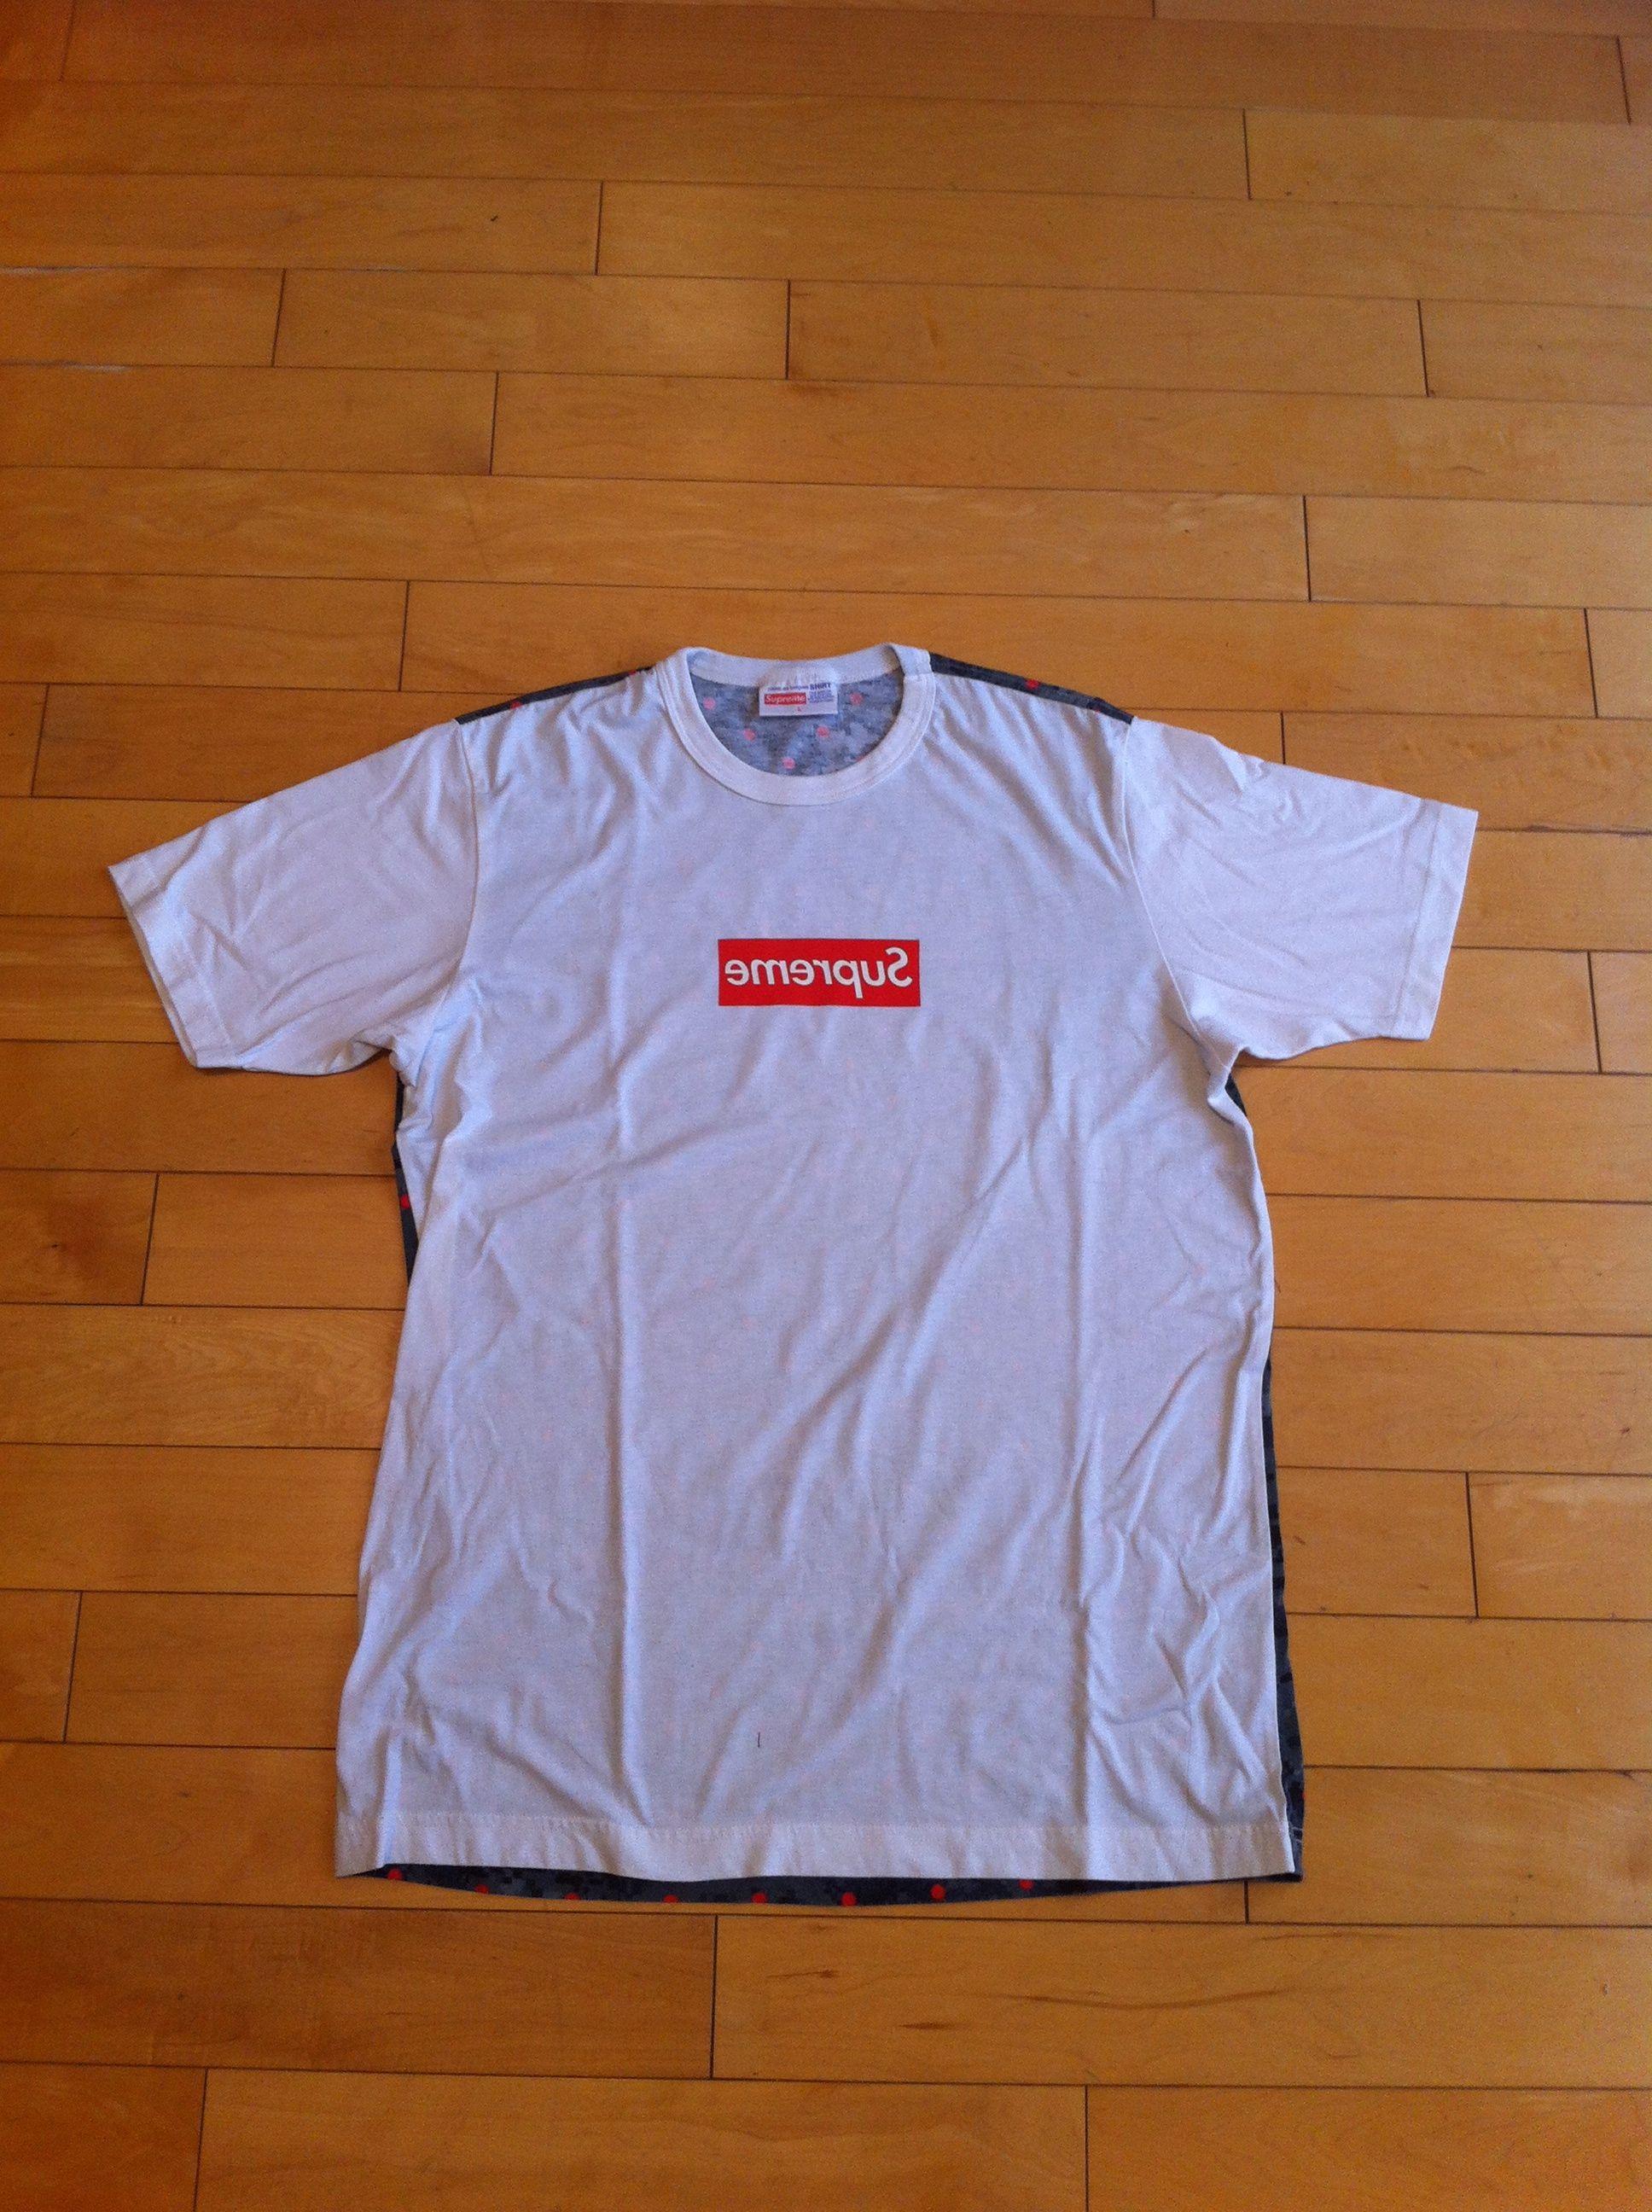 a6ddb3ee Supreme Supreme x CDG Box Logo Tee Size l - Short Sleeve T-Shirts ...